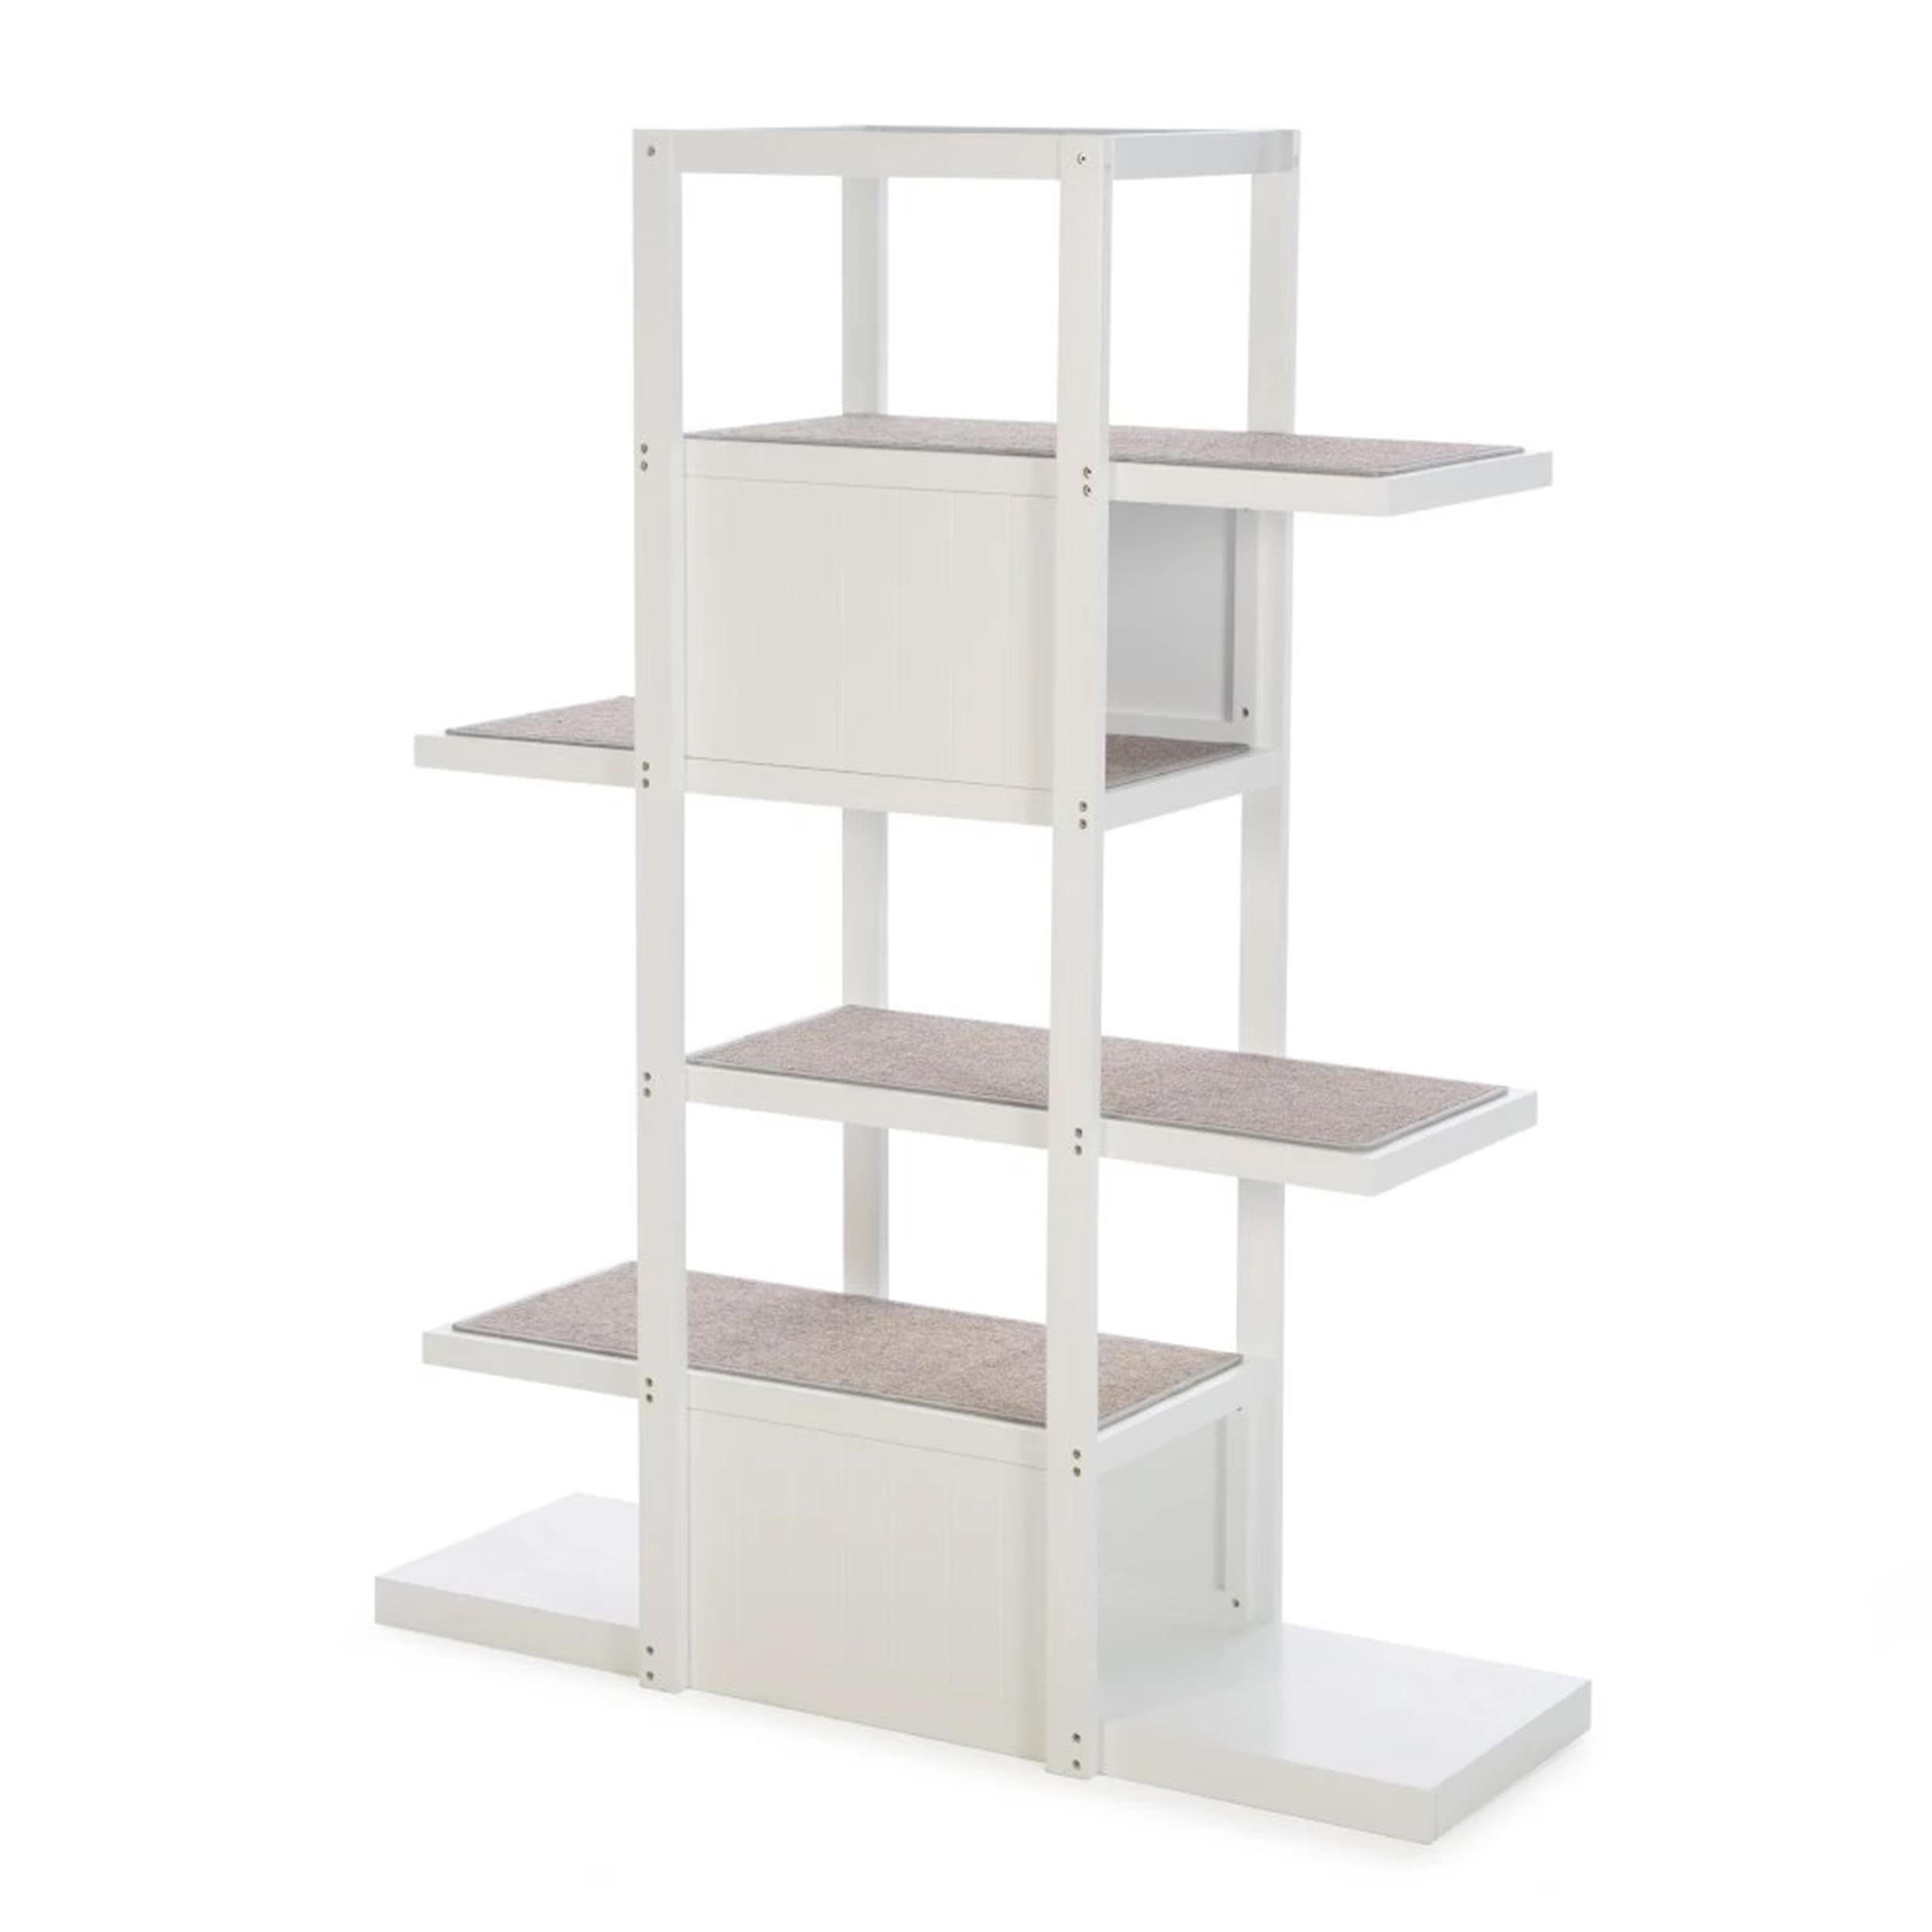 Bookshelf Cat Tree - Zoovilla TOY0151720110